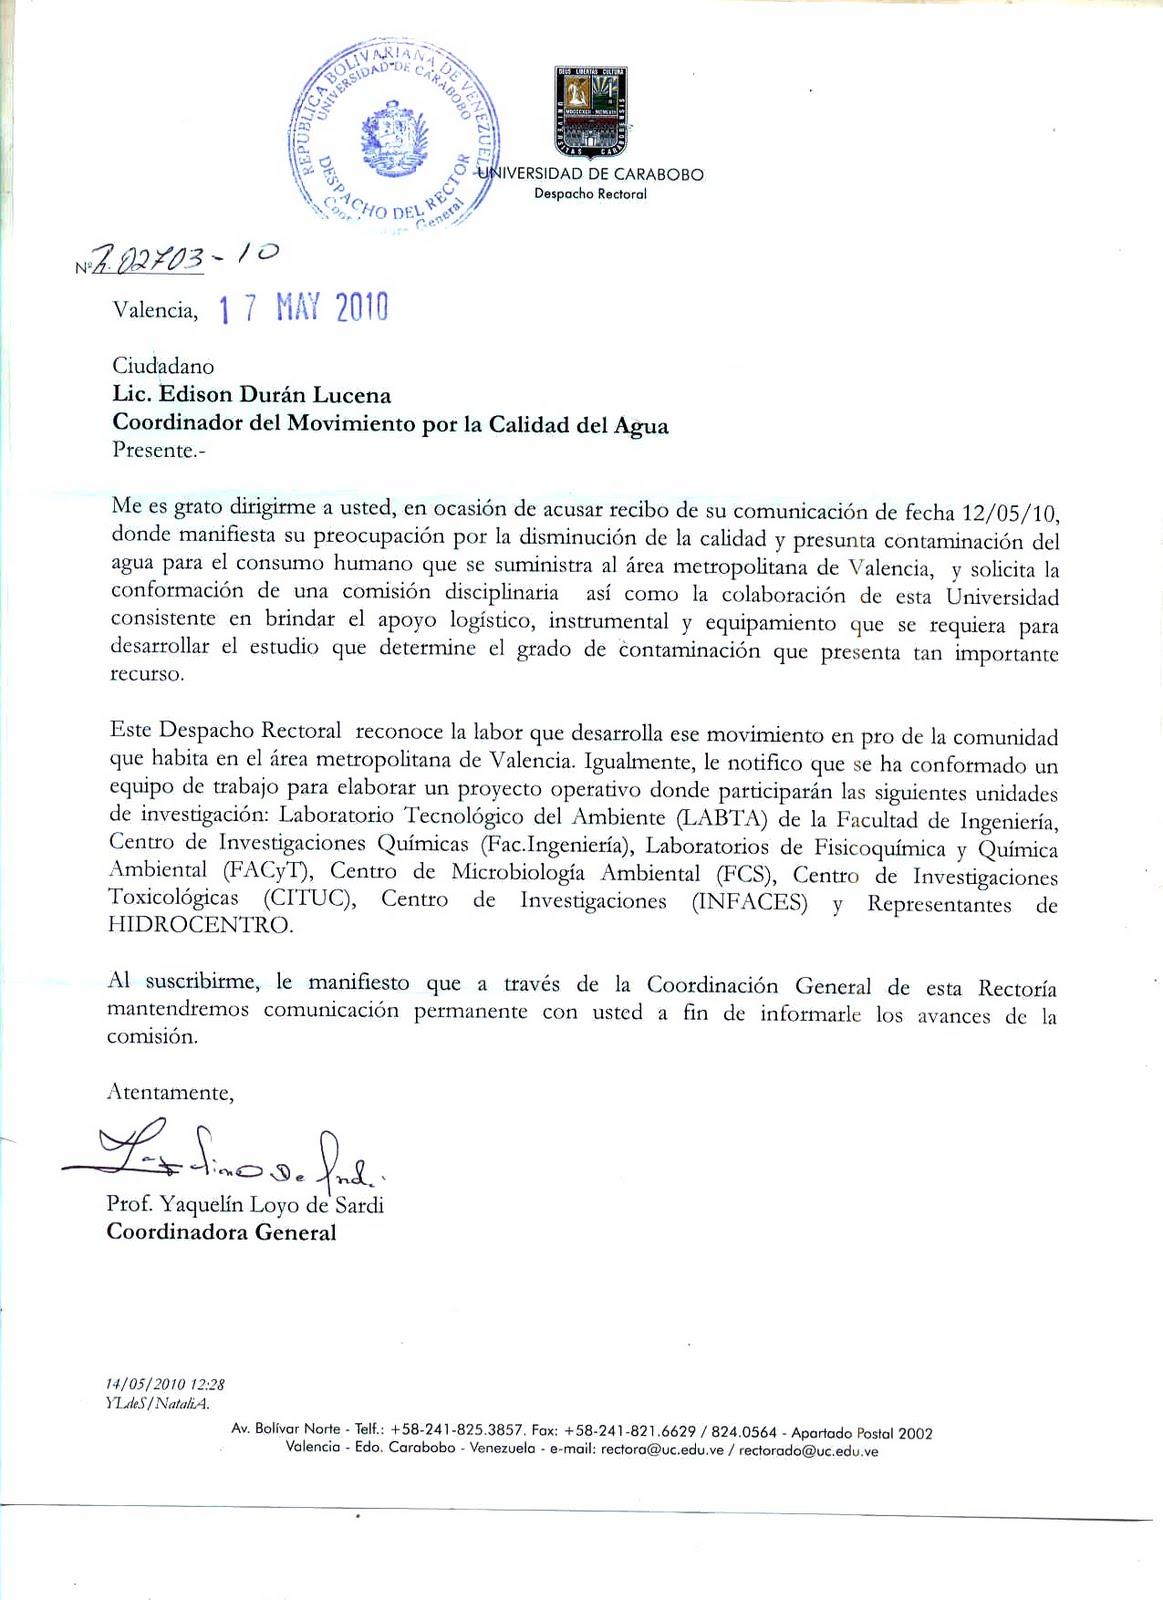 Carta Formal En Espanol Bed Mattress Sale